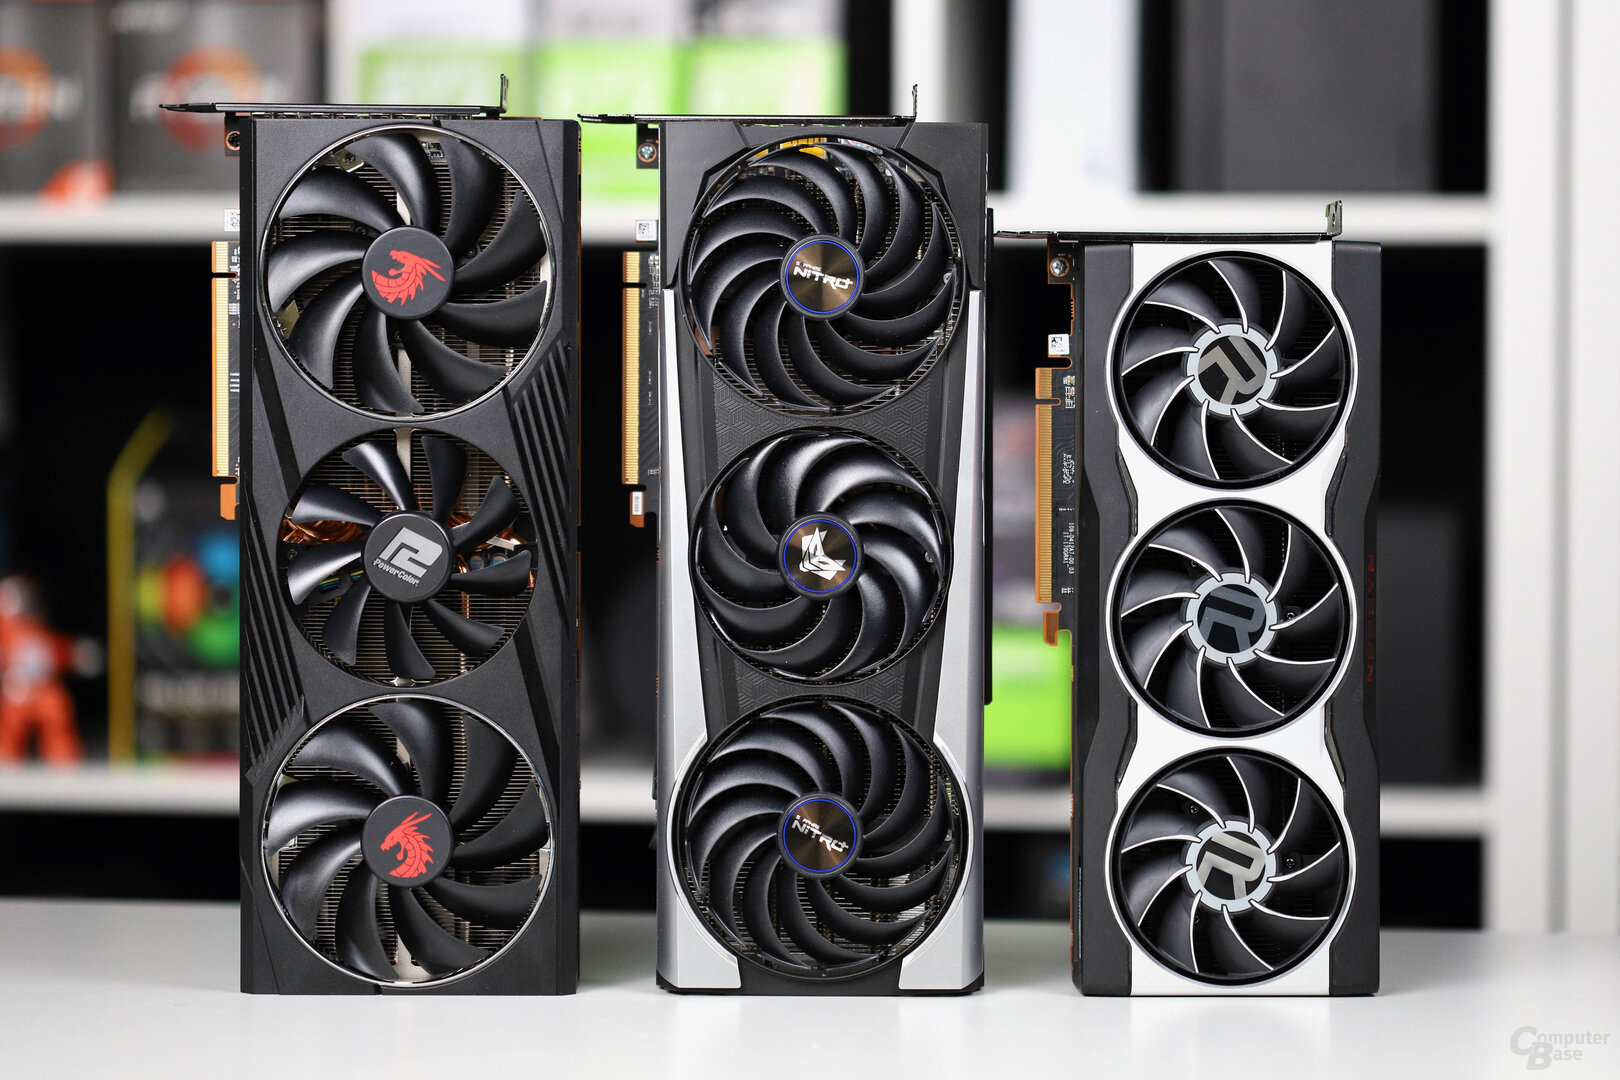 Radeon RX 6800 (